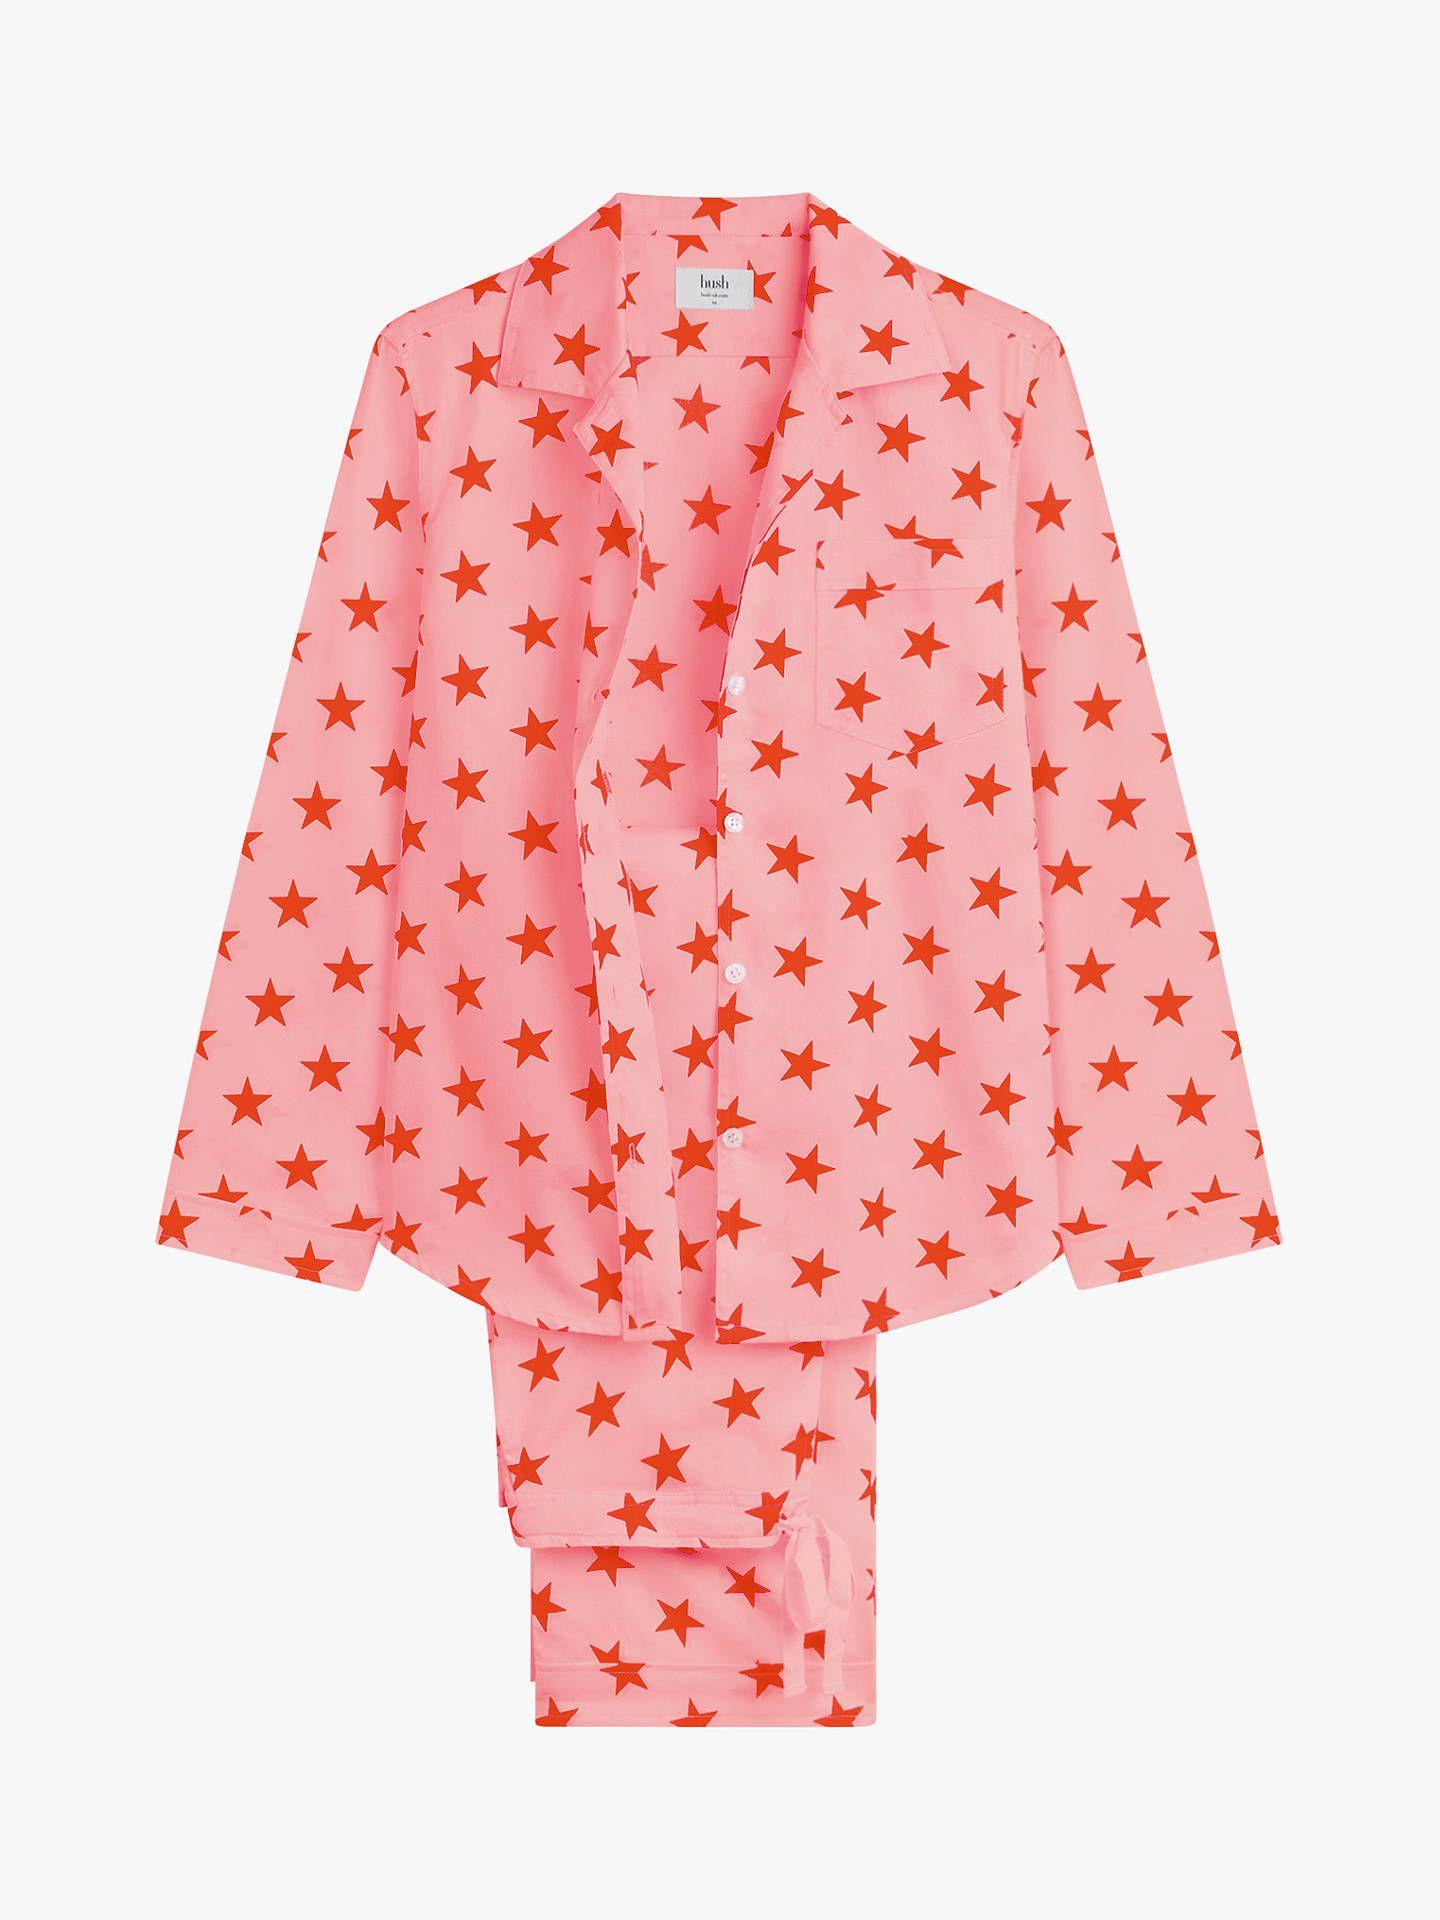 dd776f2a81 hush Star Piped Cotton Pyjama Set, Pink at John Lewis & Partners ...